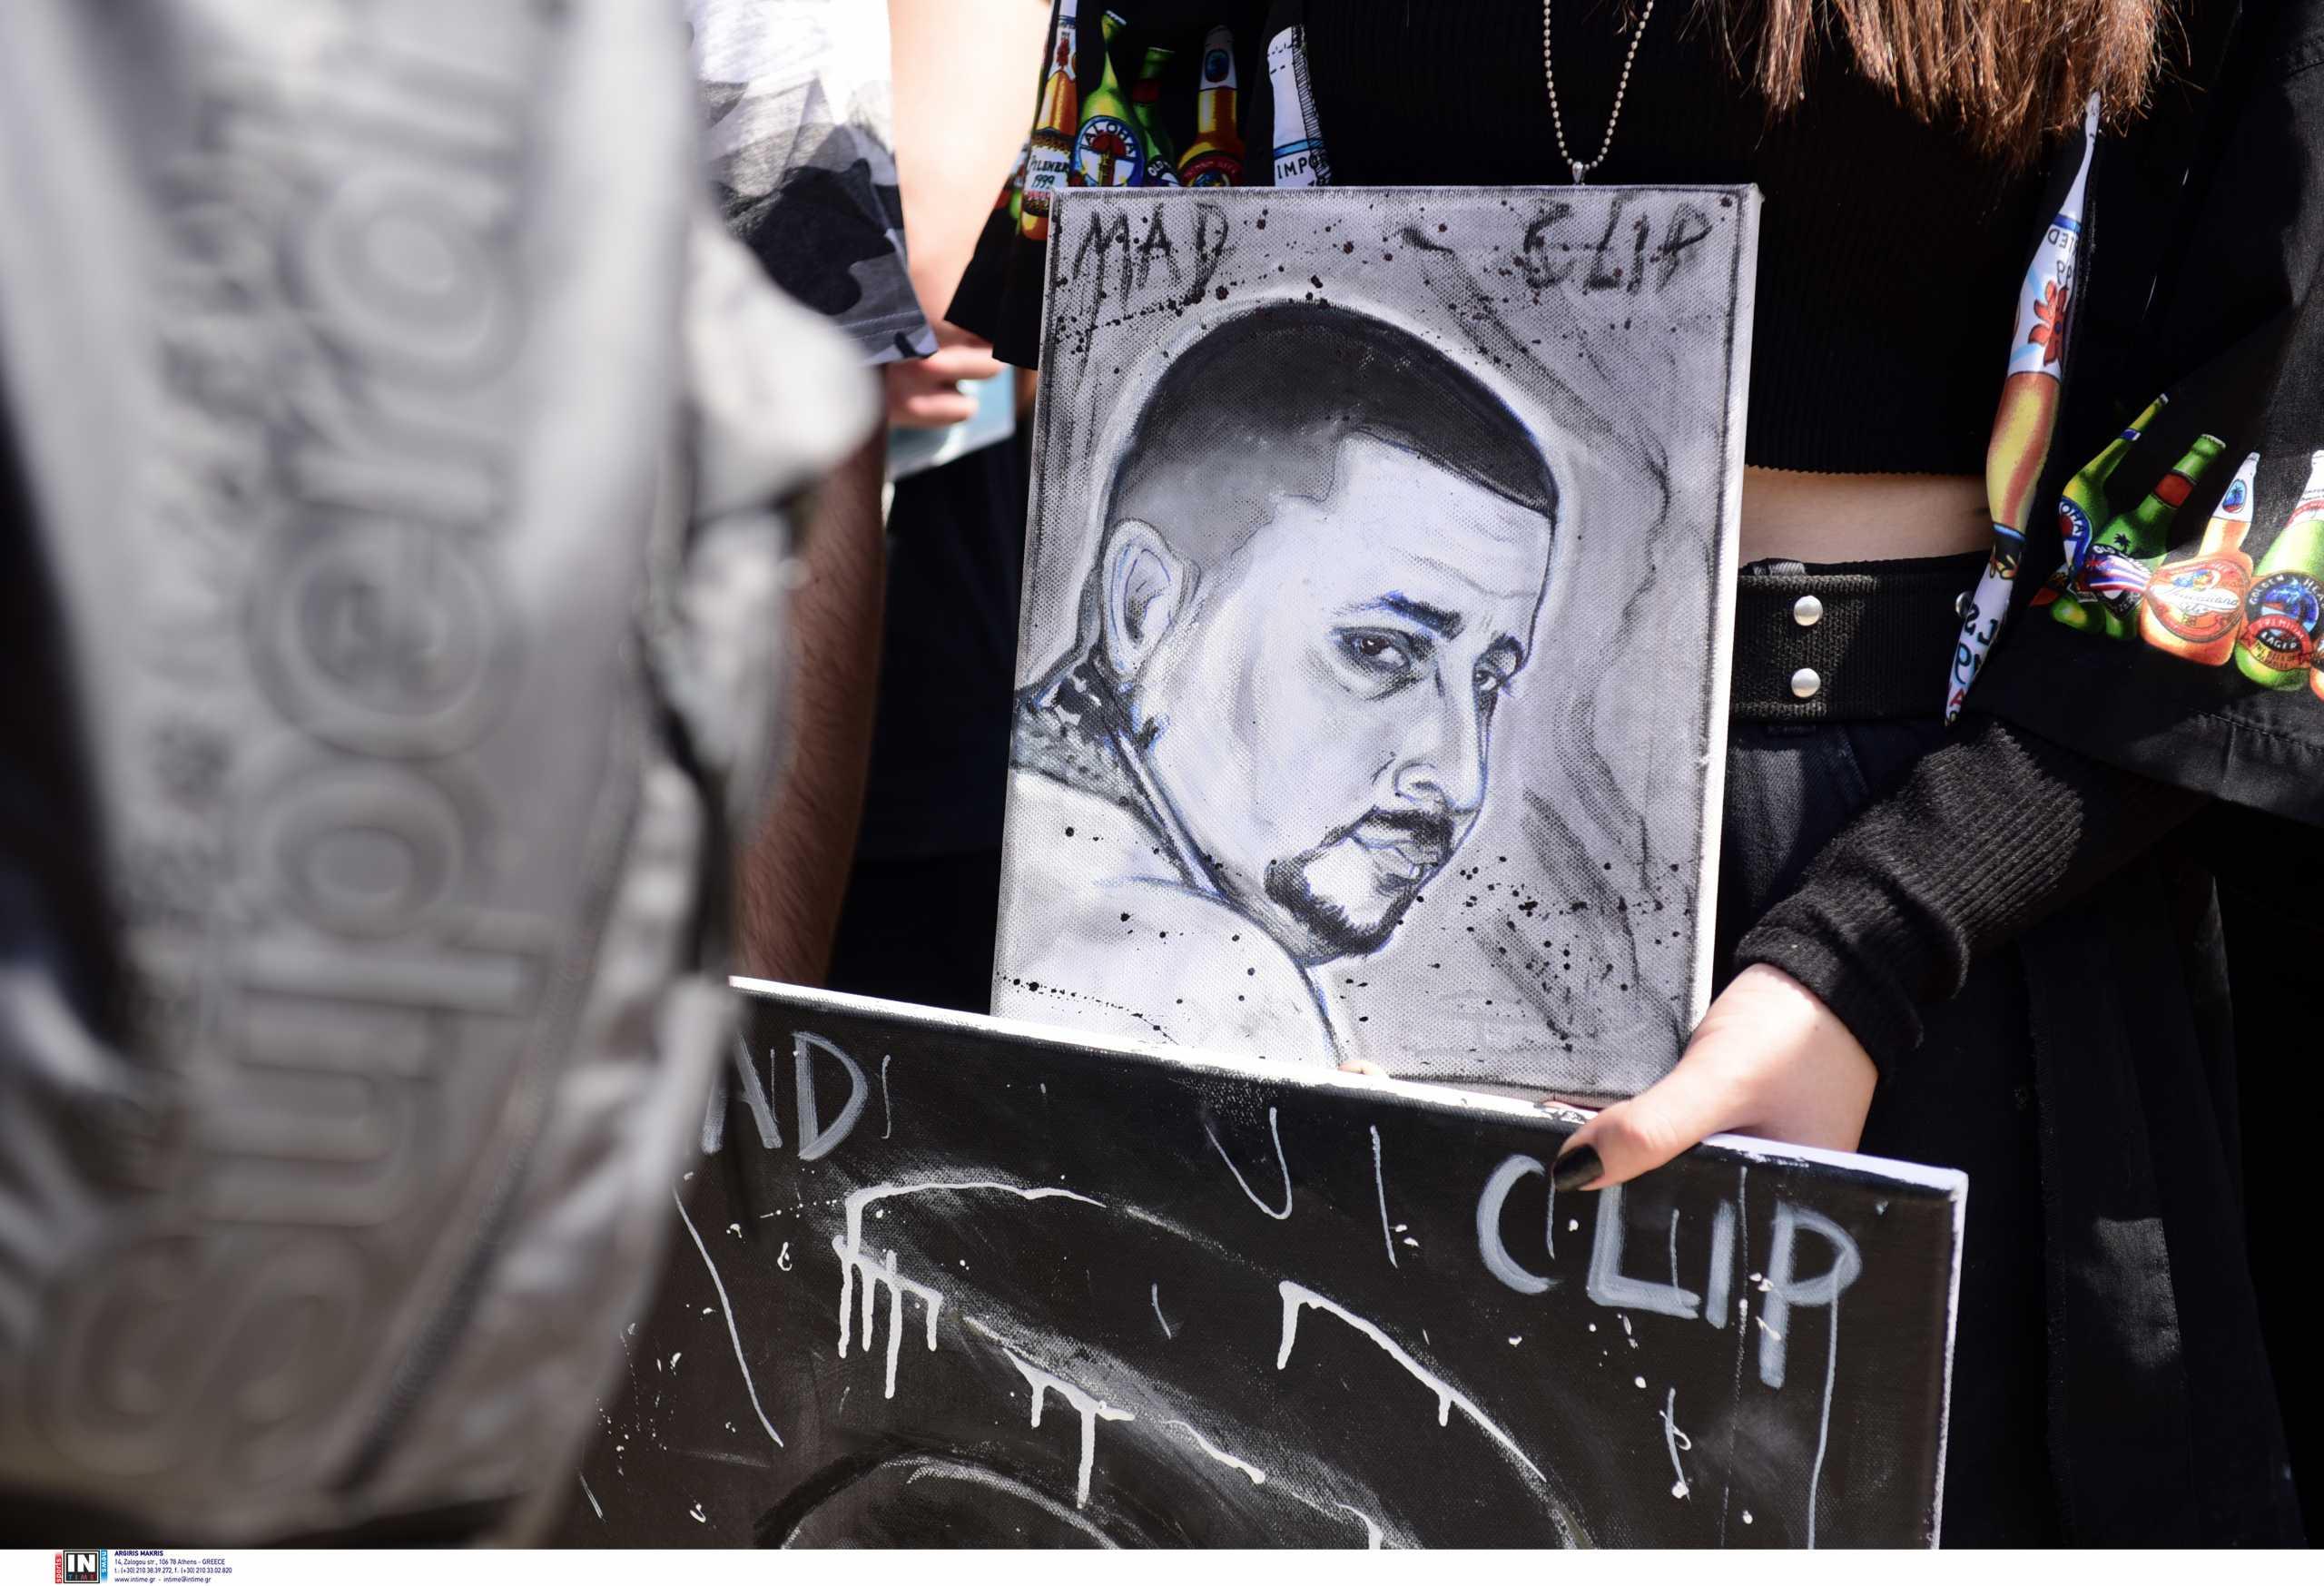 Mad Clip: Αποτροπιασμός με φωτογραφία του μέσα από το νεκροτομείο